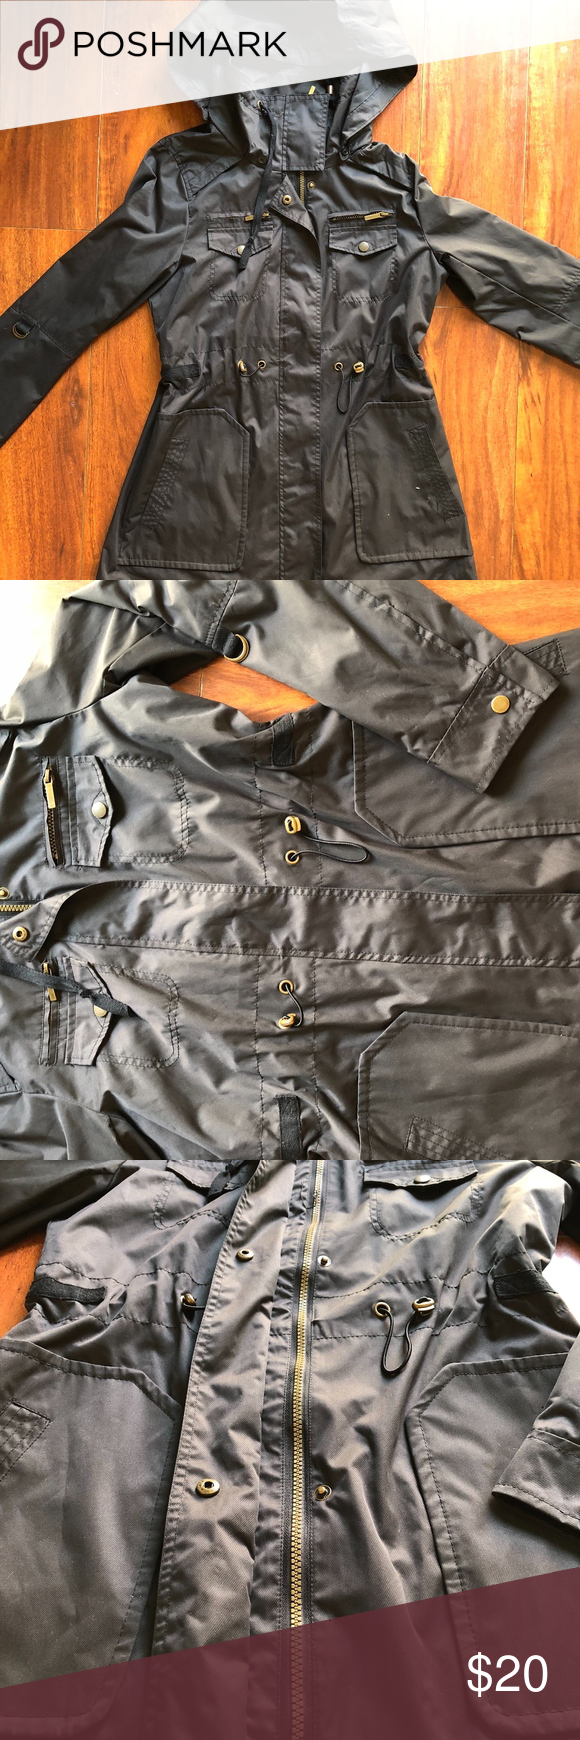 Yoki Outerwear Coat Yogi Outerwear Brand Gray Coat Size Medium Detachable Hood Singed Waist Yoki Jackets Coats Utility Jackets Outerwear Outerwear Coats Yoki [ 1740 x 580 Pixel ]